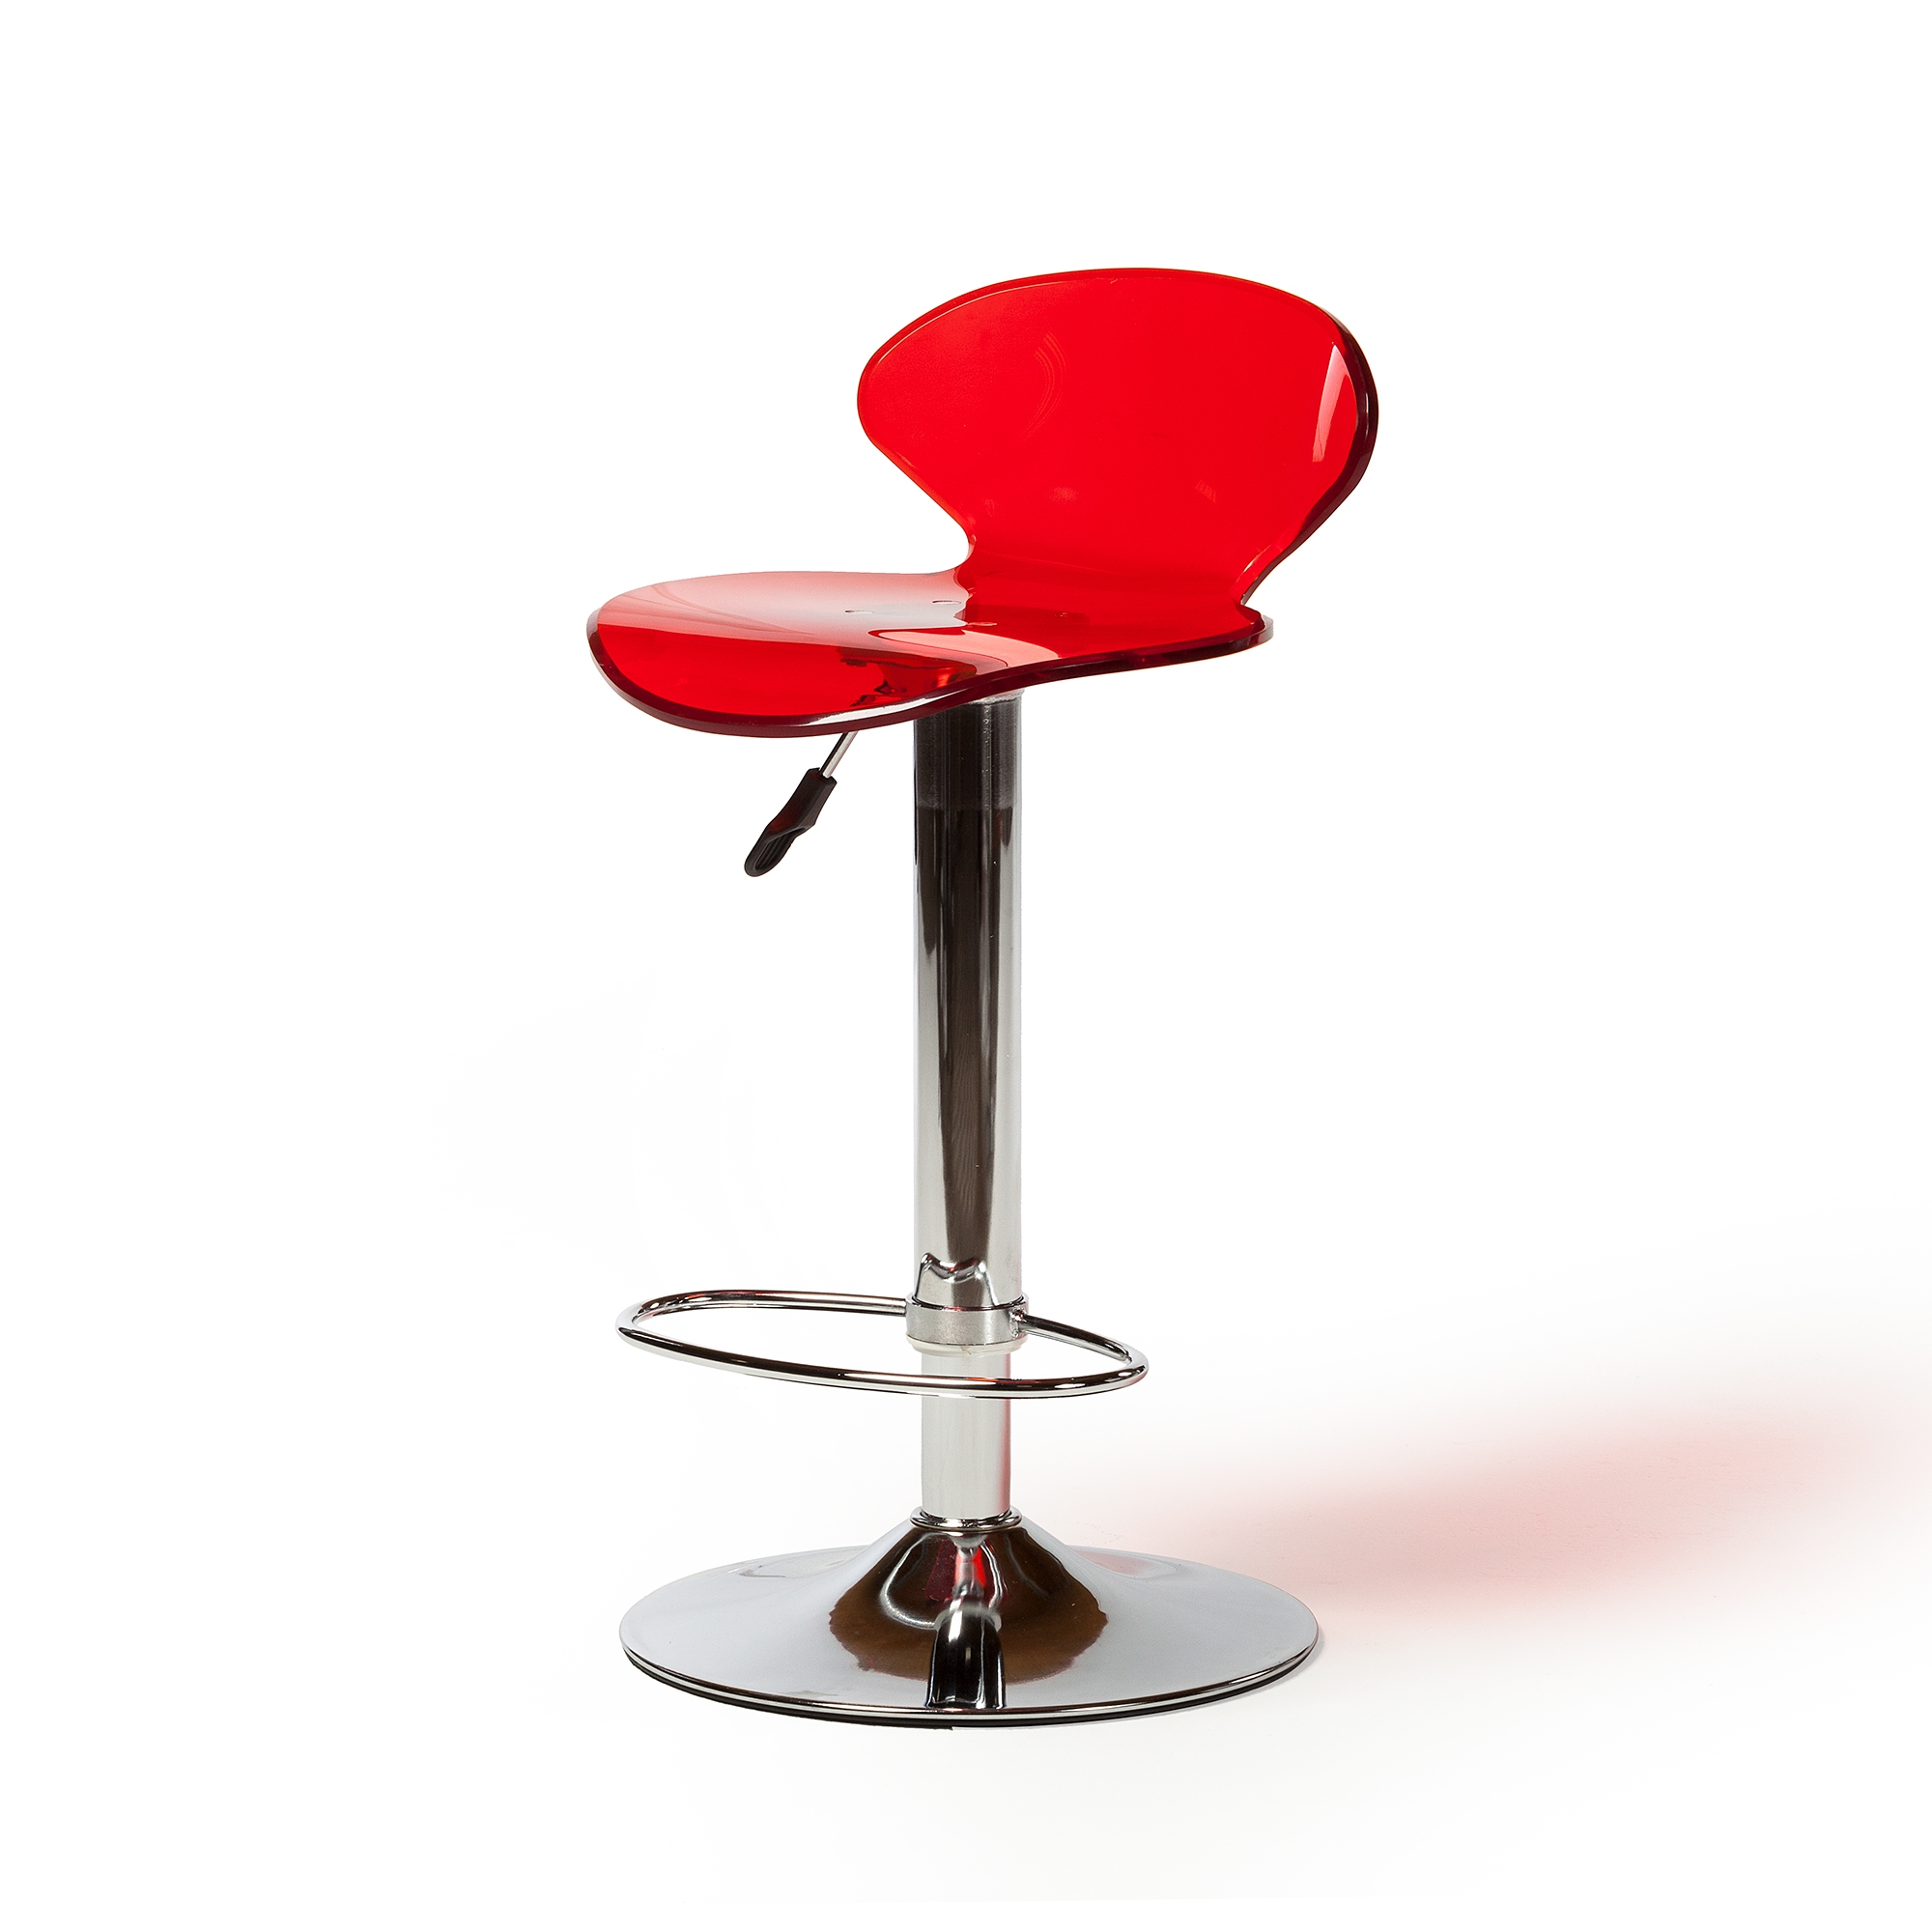 Red Lucite Seat Adjule Swivel Bar Stool